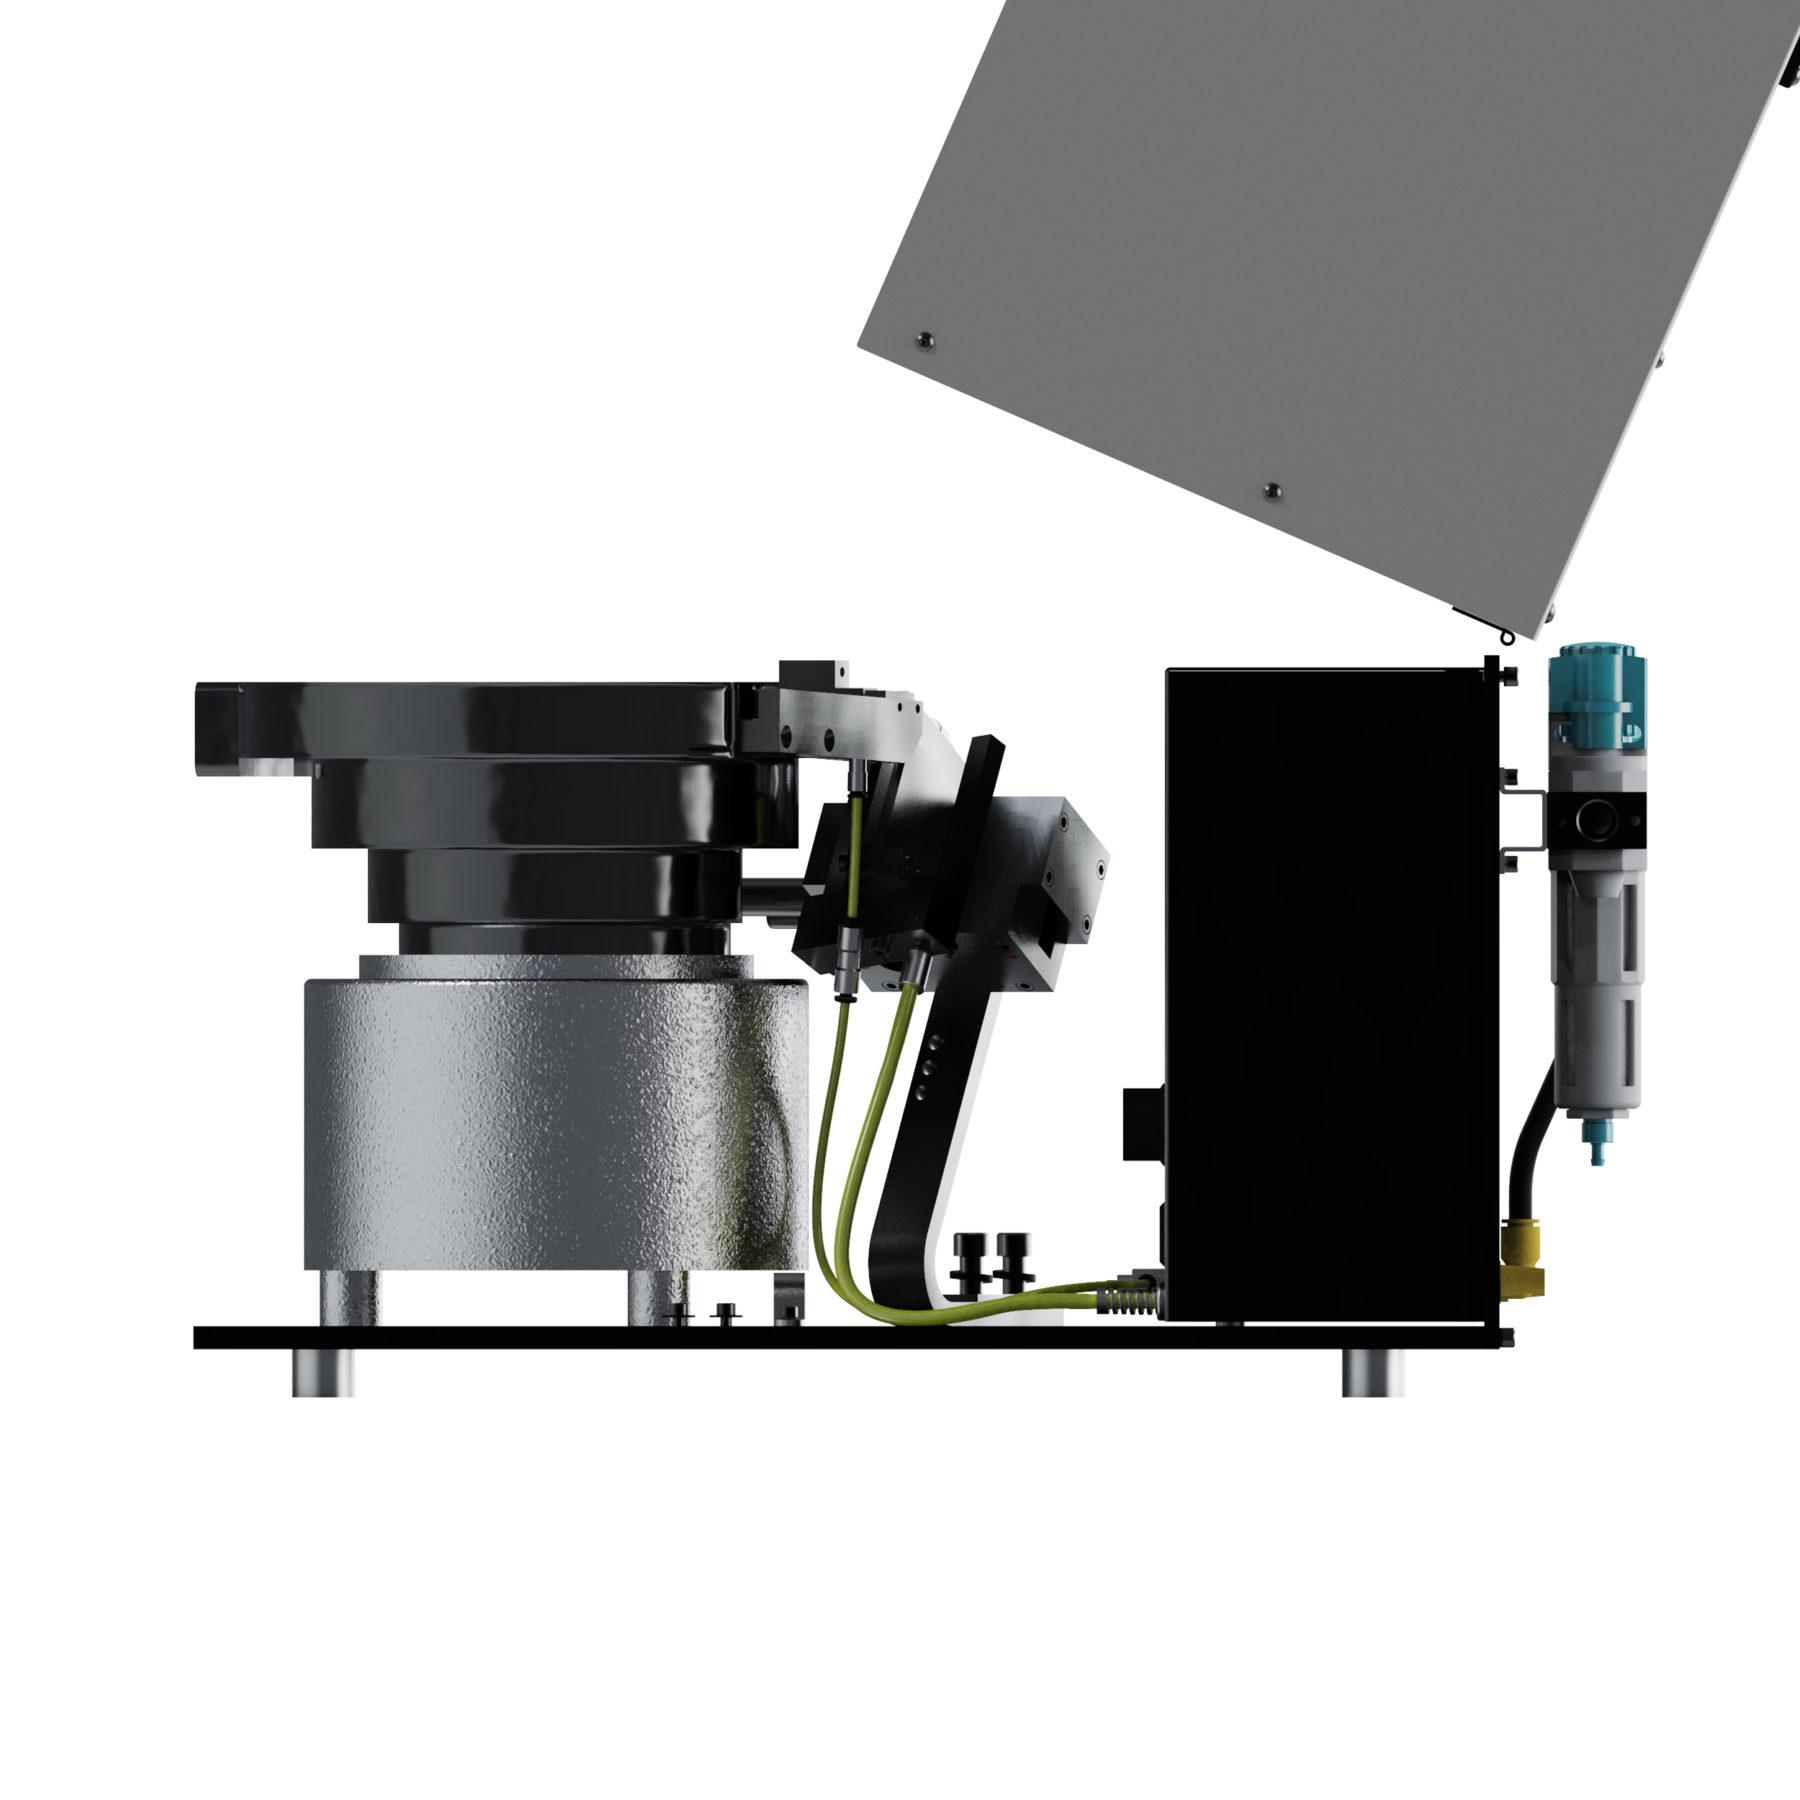 A10 Vibratory Bowl Screw Feeder Carlson Engineering Side 16